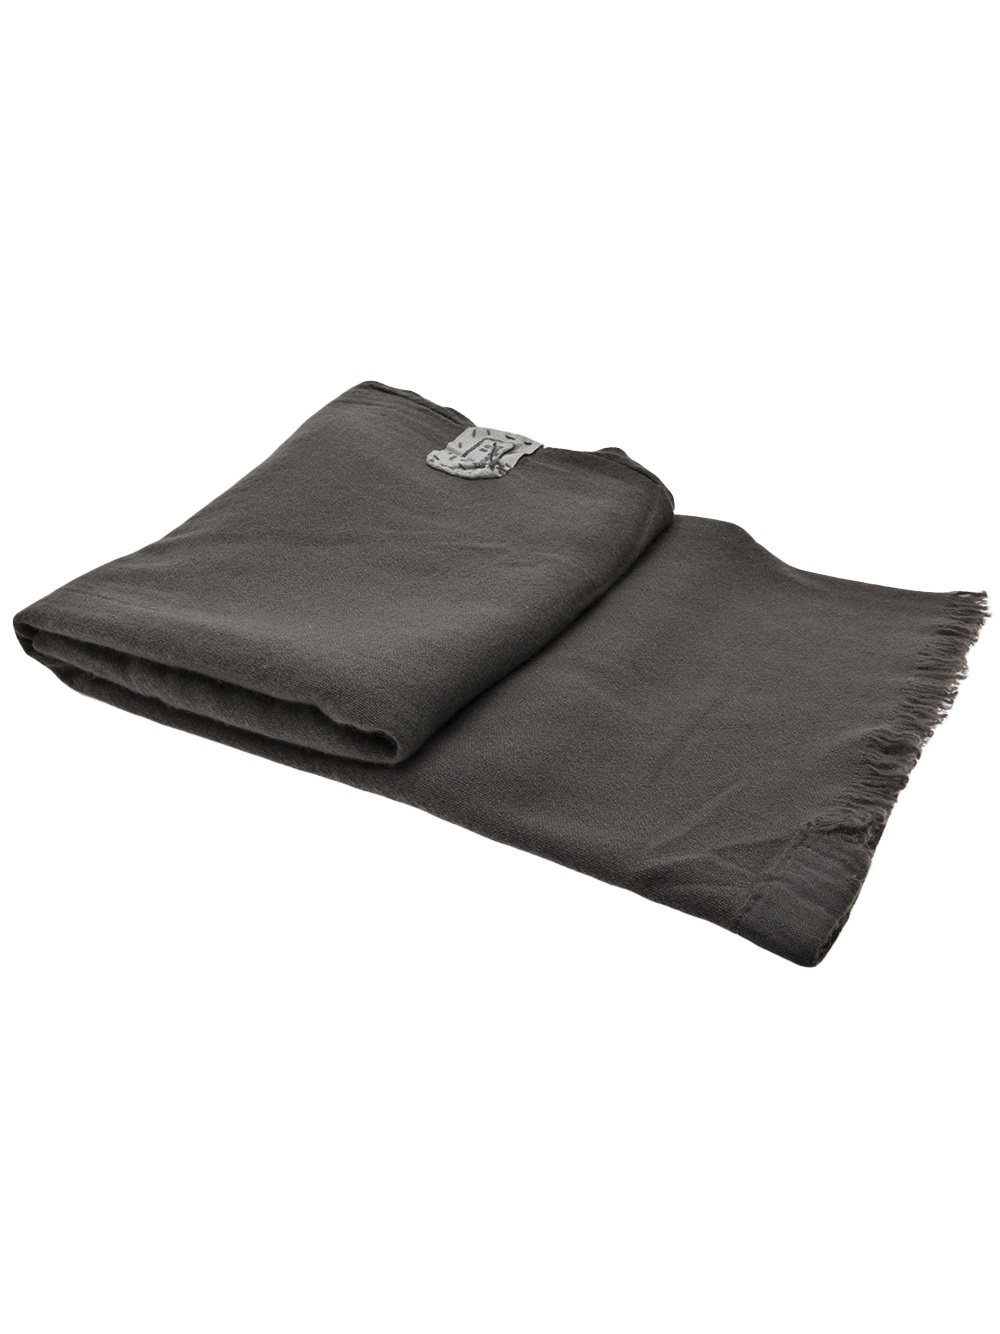 Old Black/ Café Cashmere Blanket  - Inquire